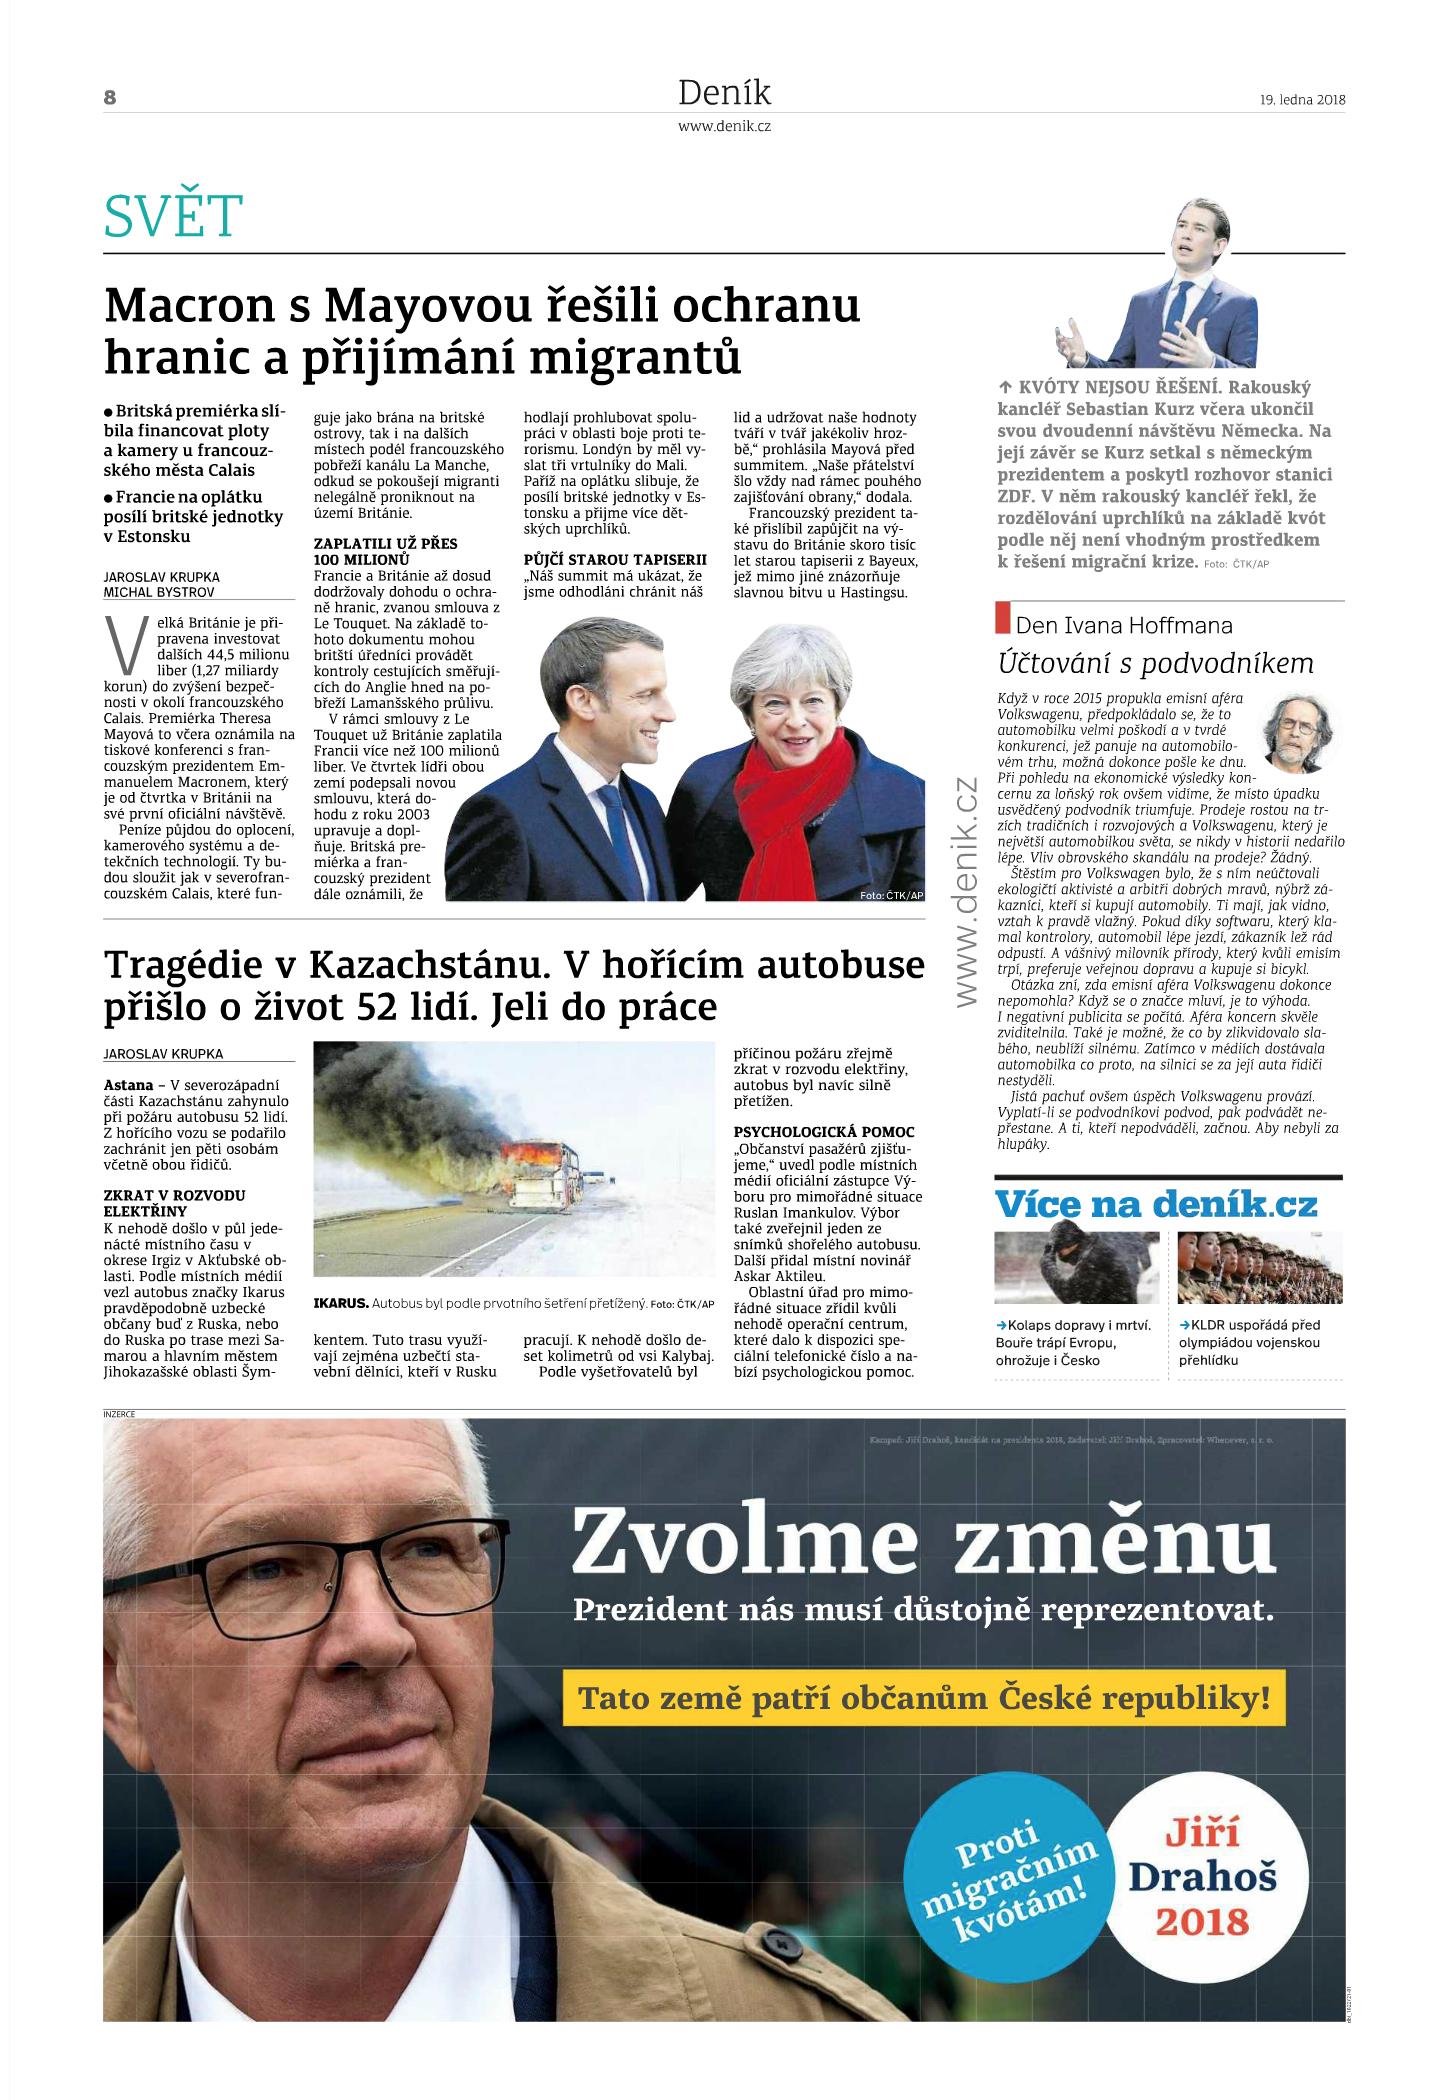 Tým Jiřího Drahoše reagoval v Deníku v pátek 19. ledna